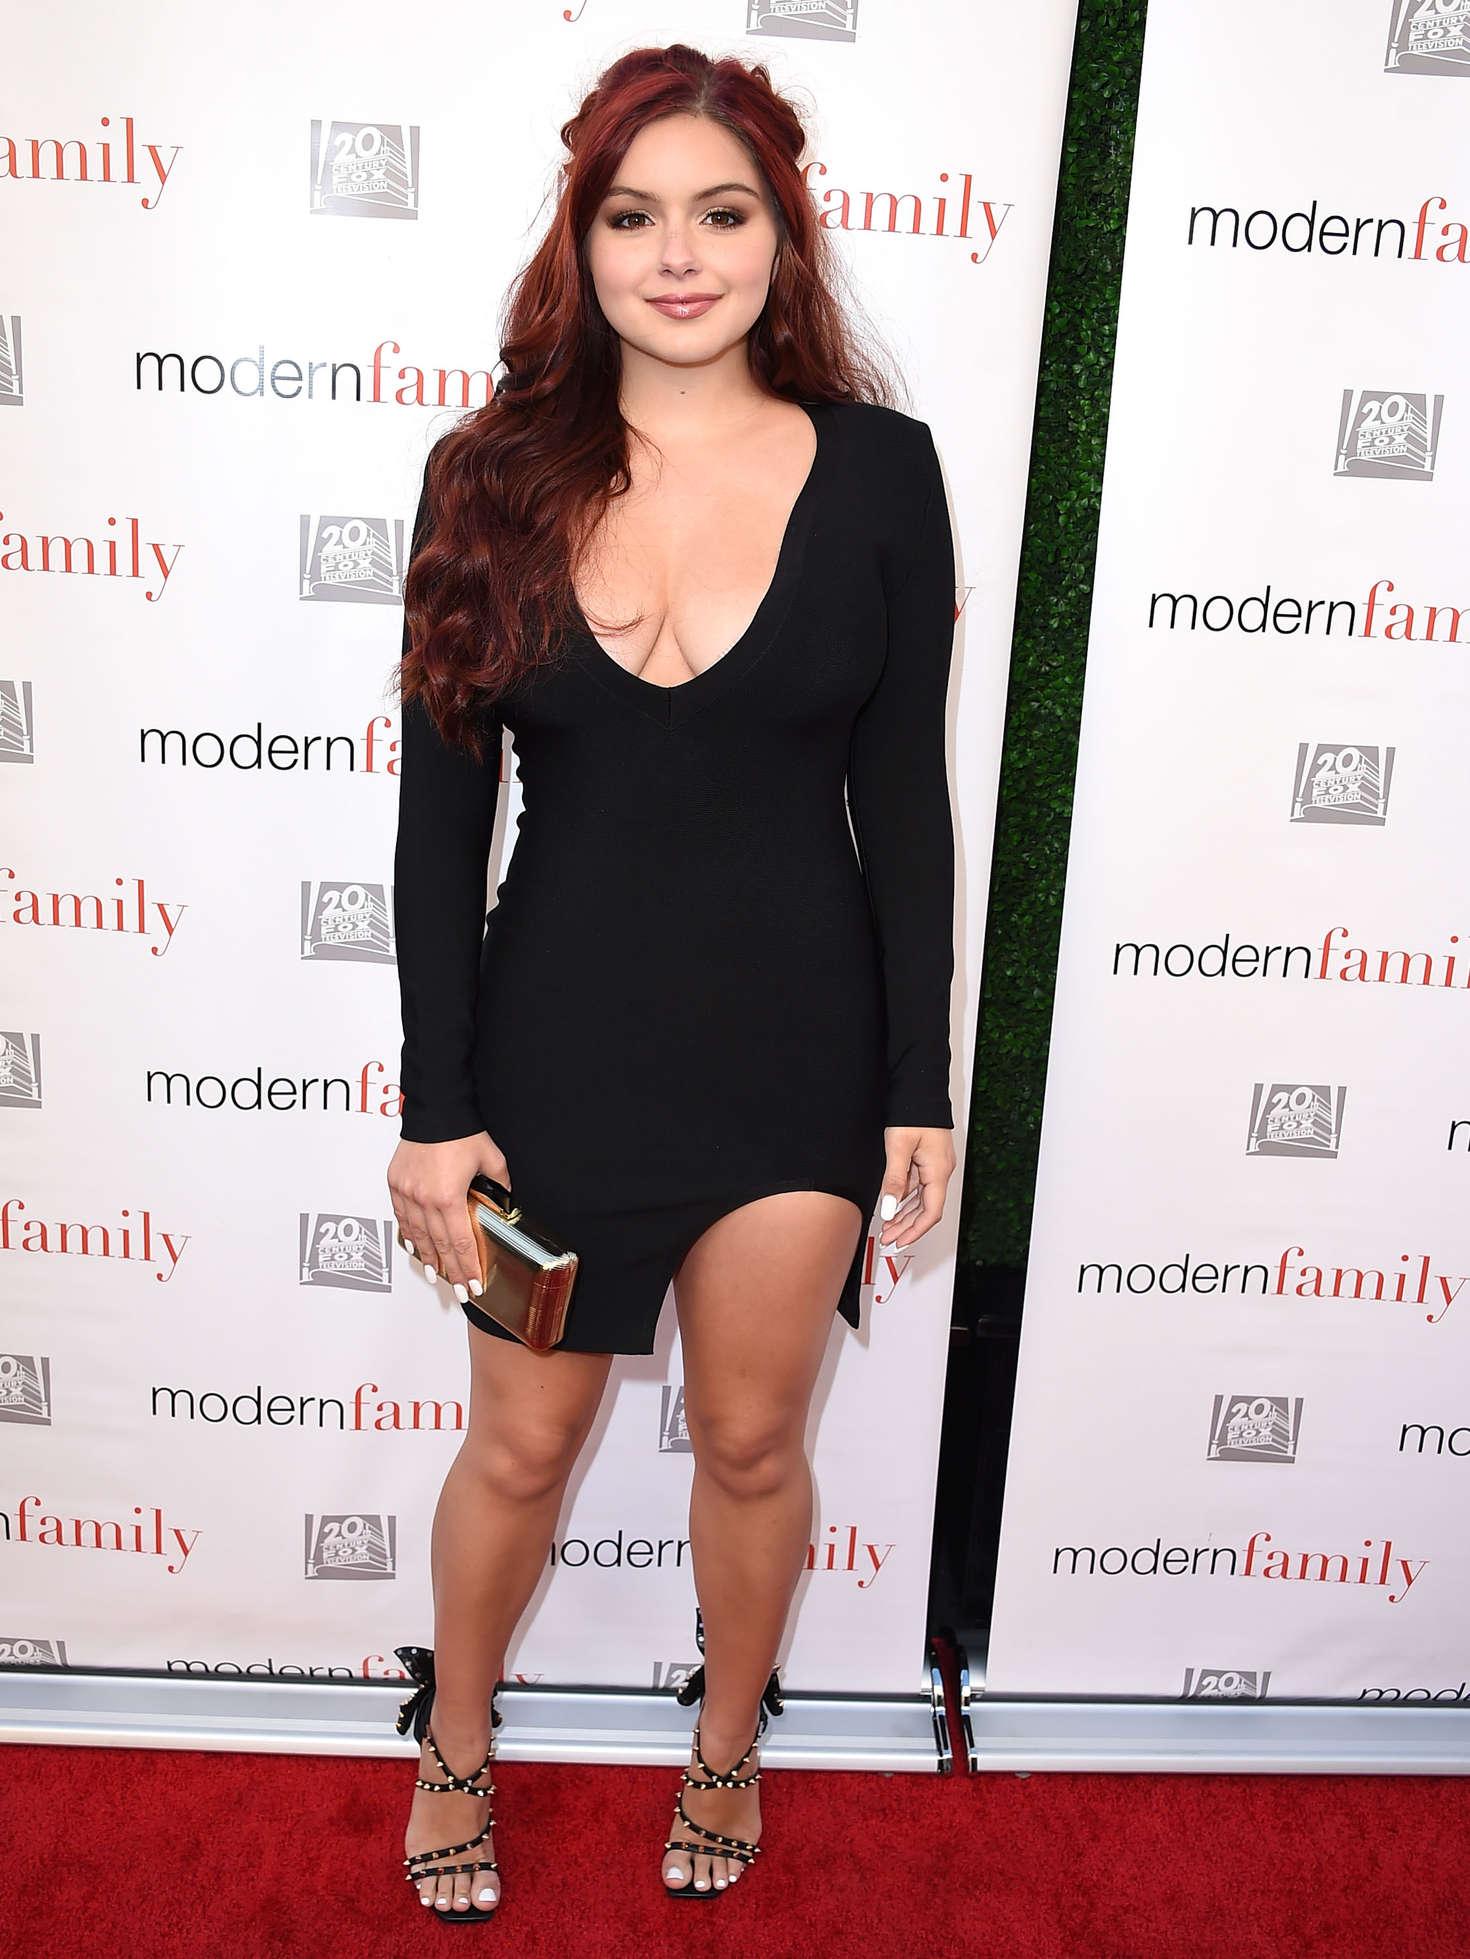 Ariel Winter: Modern Family ATAS Emmy Event -35 - GotCeleb Megan Fox